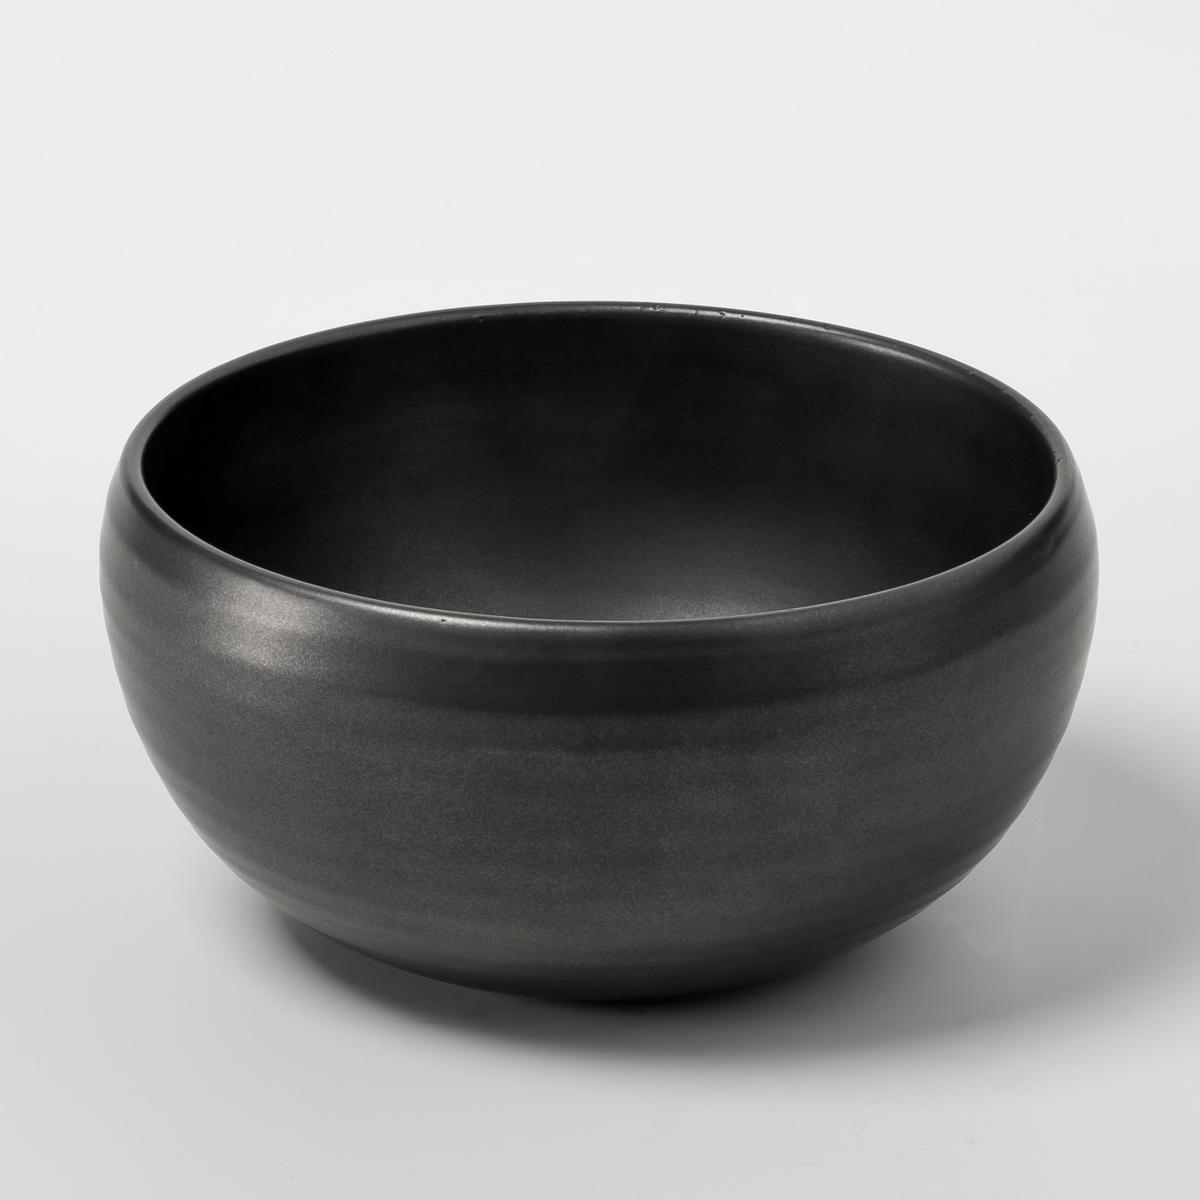 Чашка из керамики Pure дизайн П.Нессенса, Serax от La Redoute